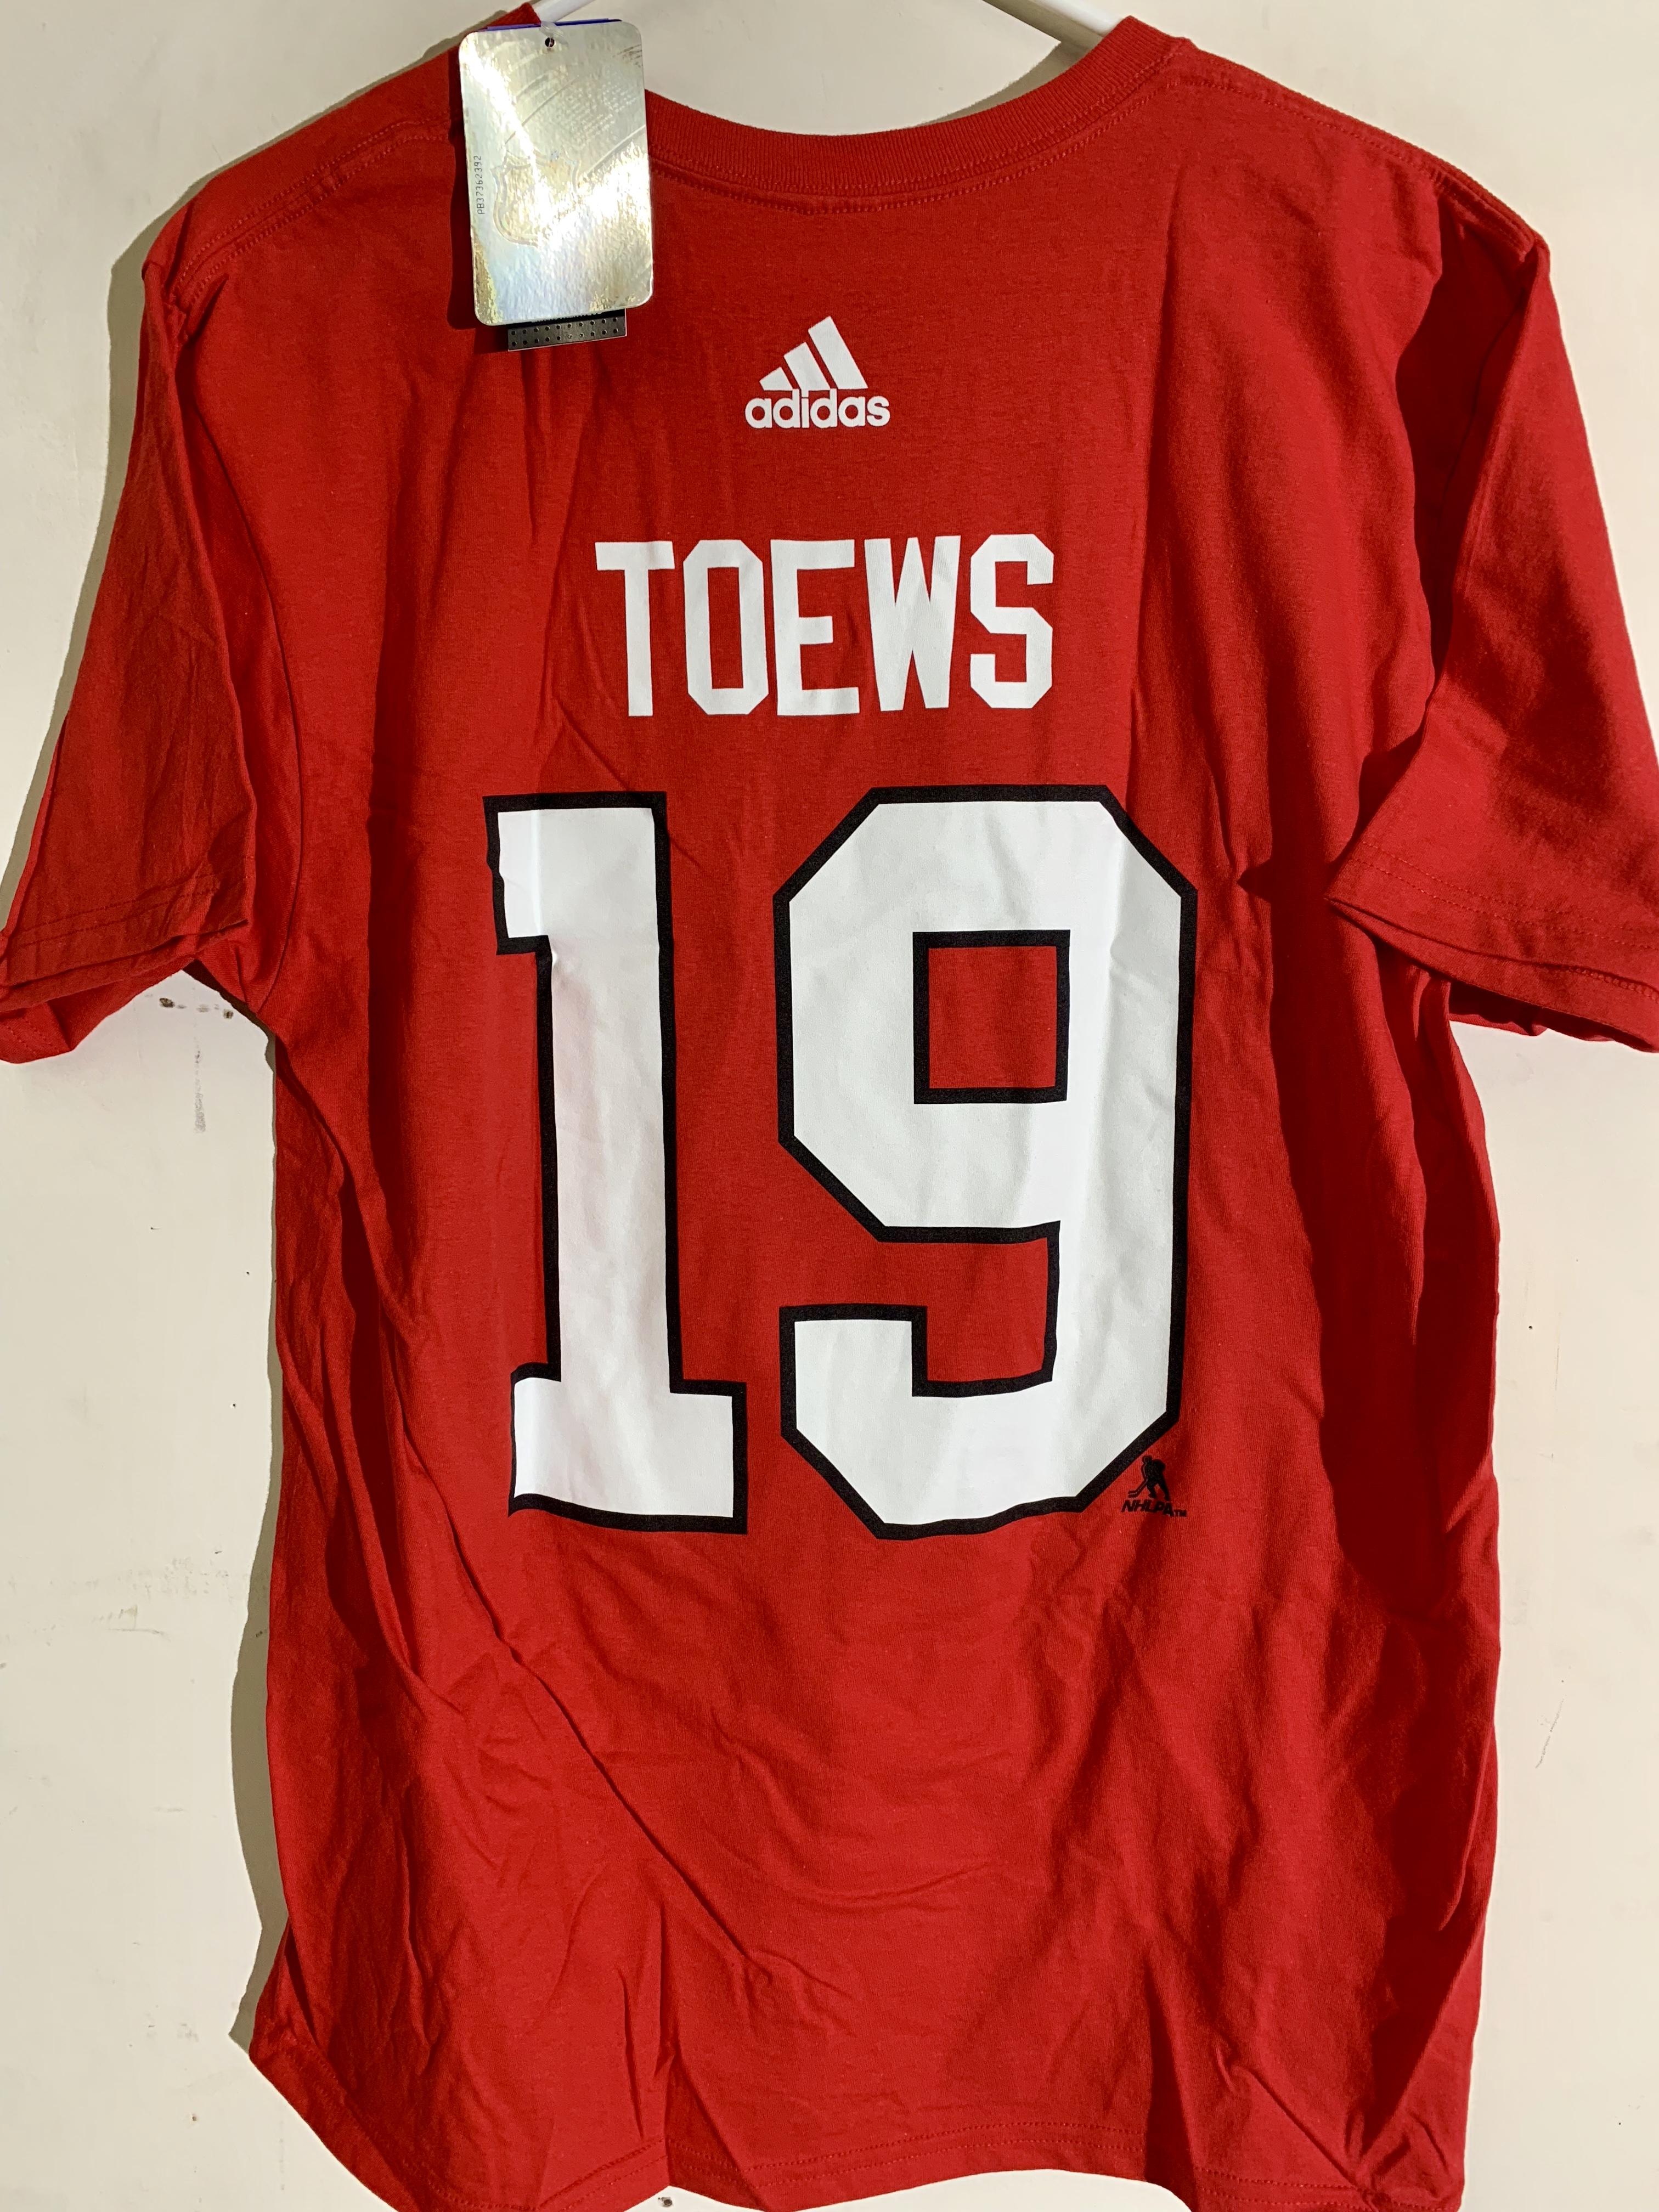 Details about adidas NHL T-Shirt Chicago Blackhawks Jonathan Toews Red sz L 8afafac2ec50f